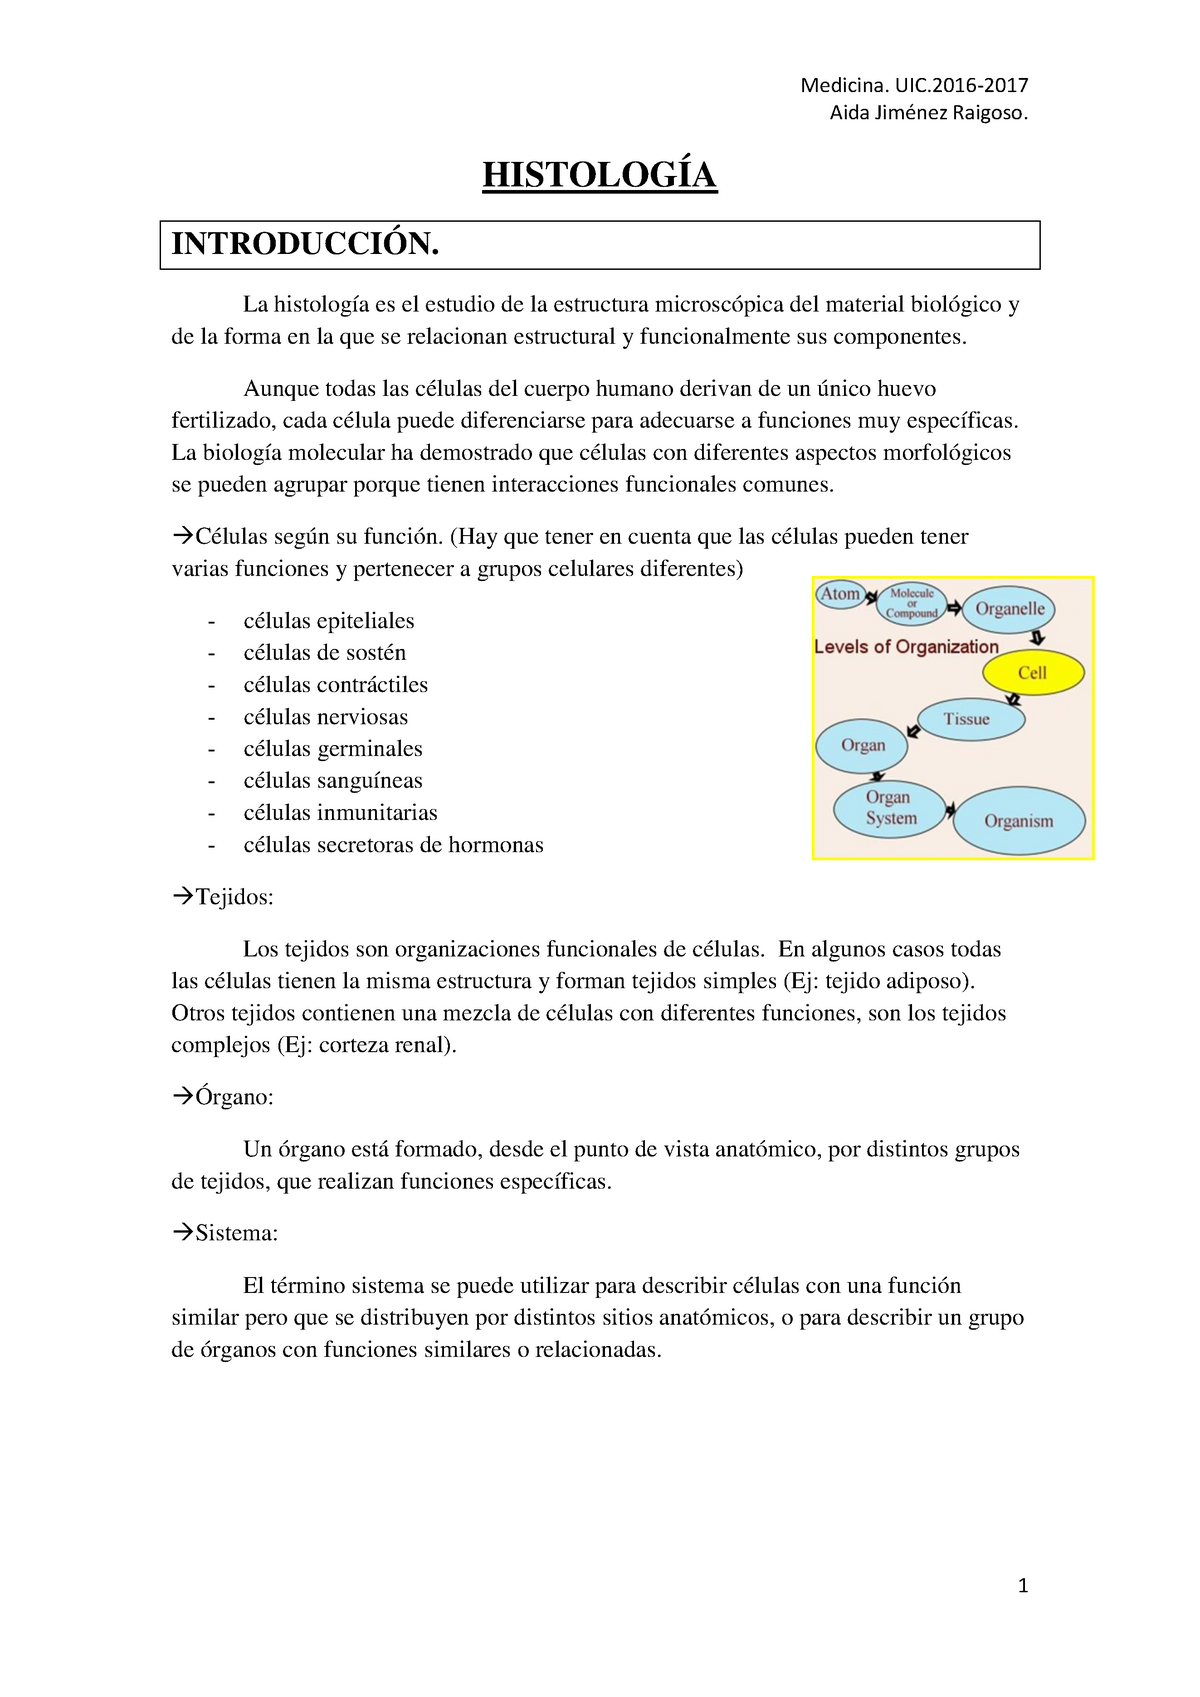 Histología Parte I Uic Barcelona Studocu